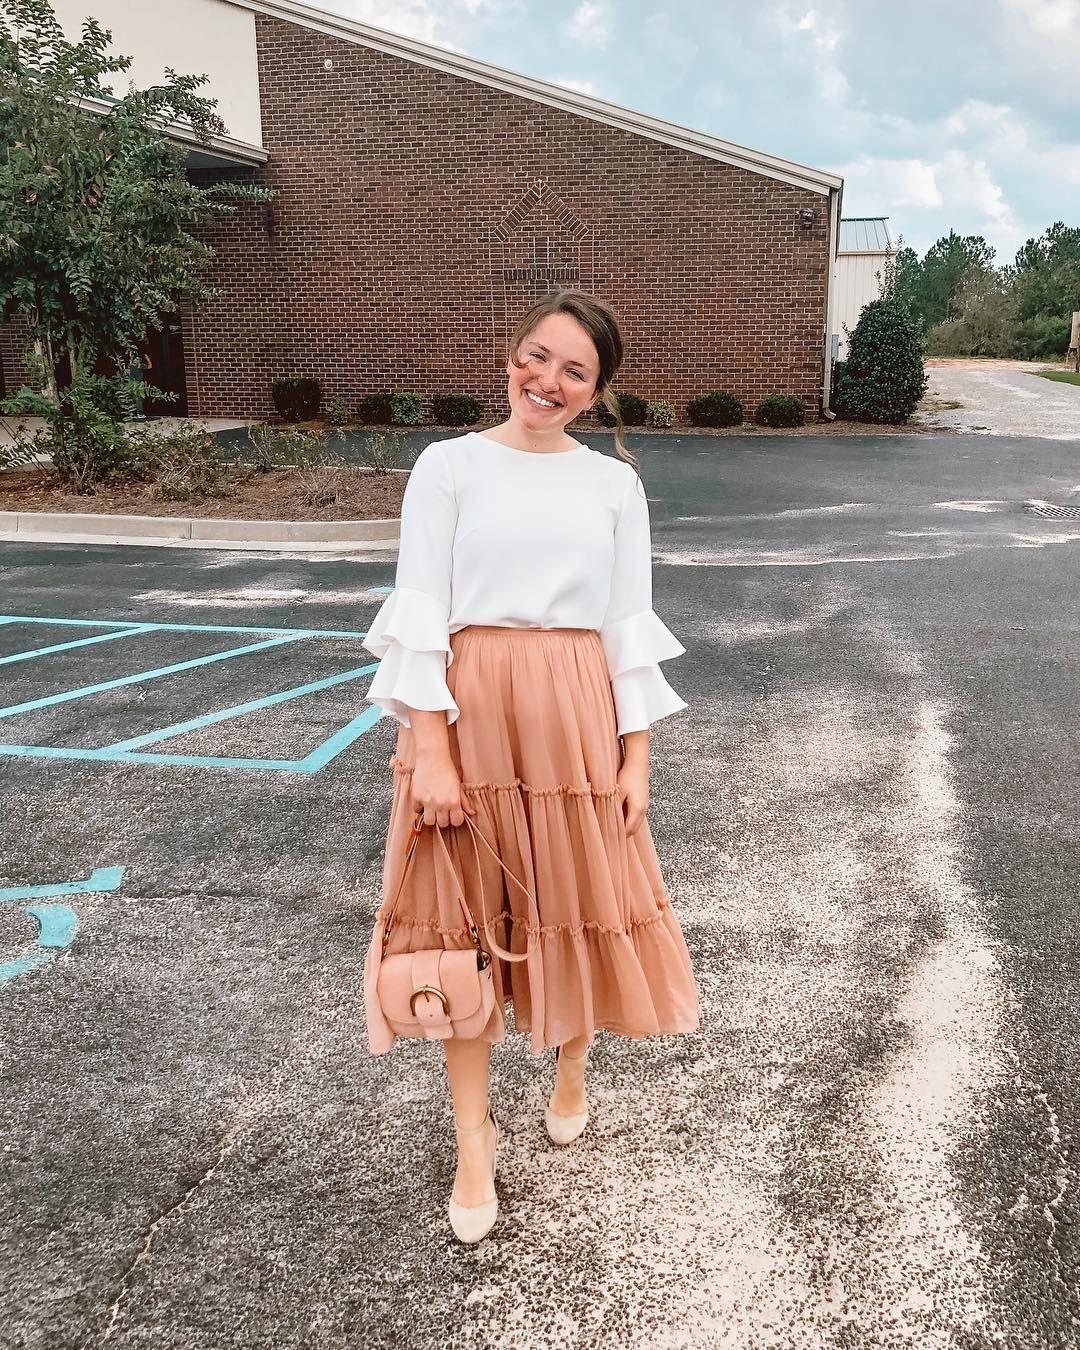 6 731 Likes 71 Comments Courtney Toliver Guthrie Courtneytoliver On Instagram Sunday S Best Dresses For Teens Sunday Outfits Prom Dresses For Teens [ 1350 x 1080 Pixel ]